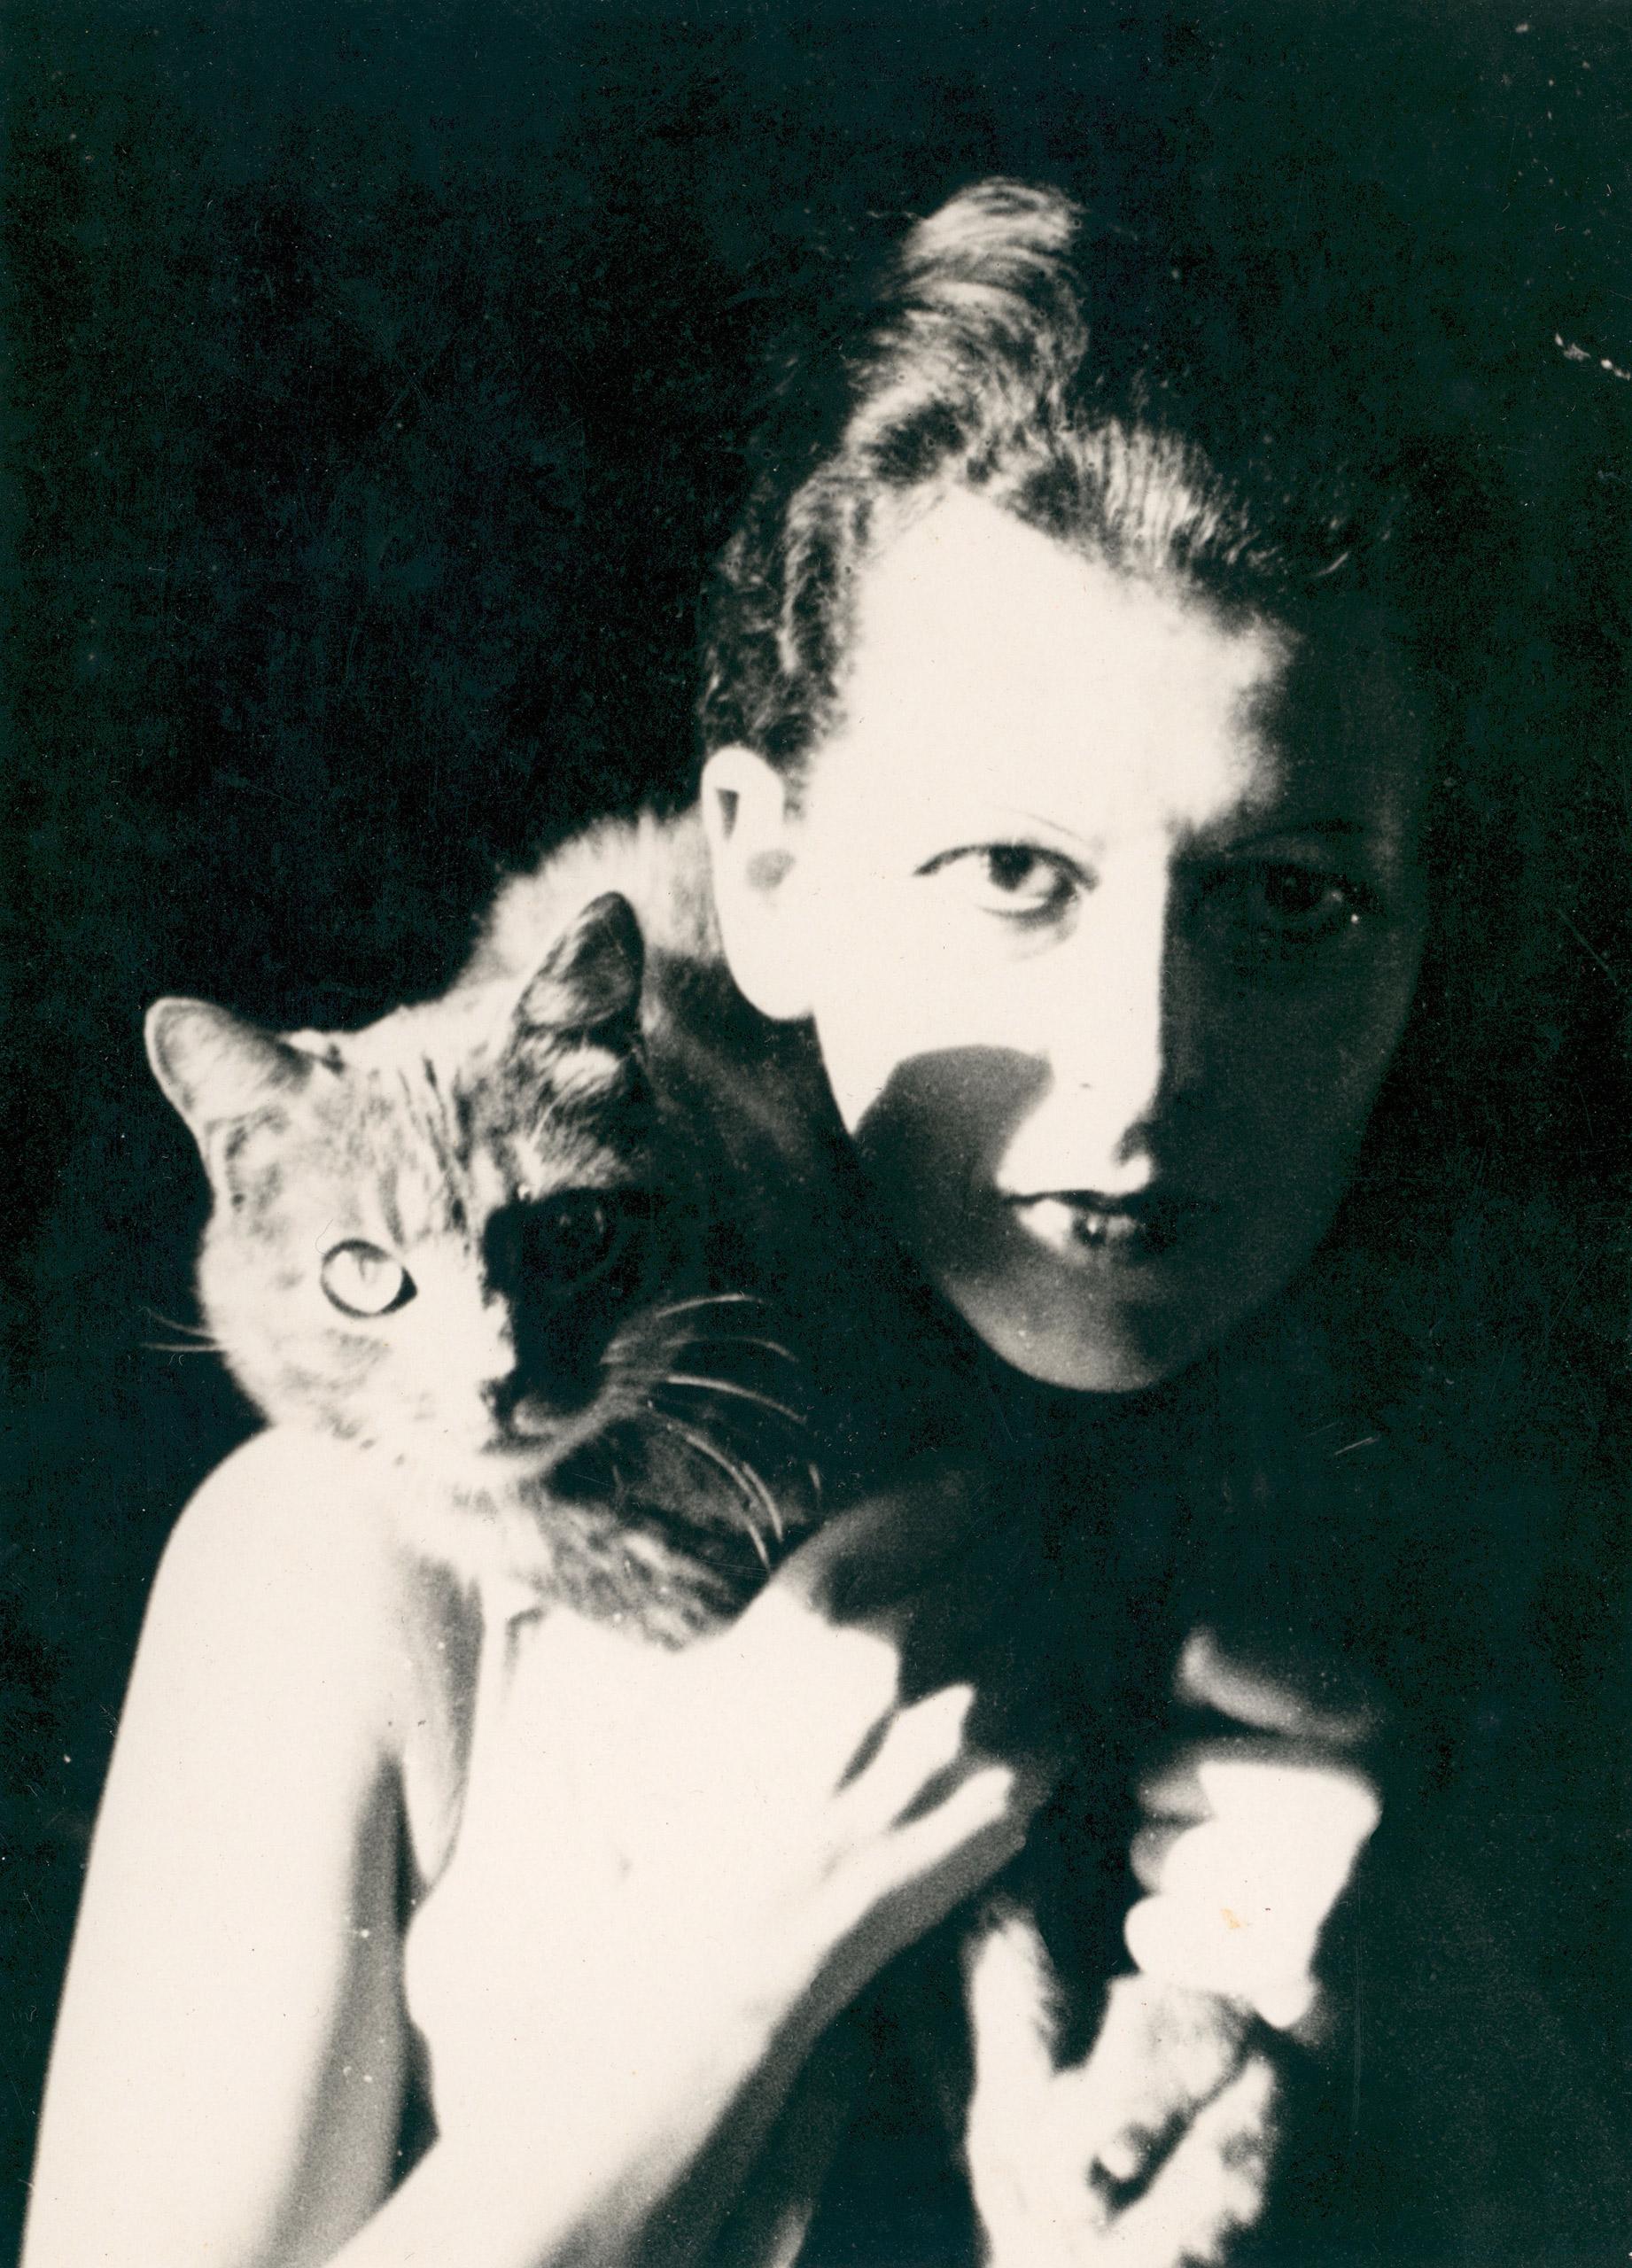 Artist Claude Cahun her cat., 1927.